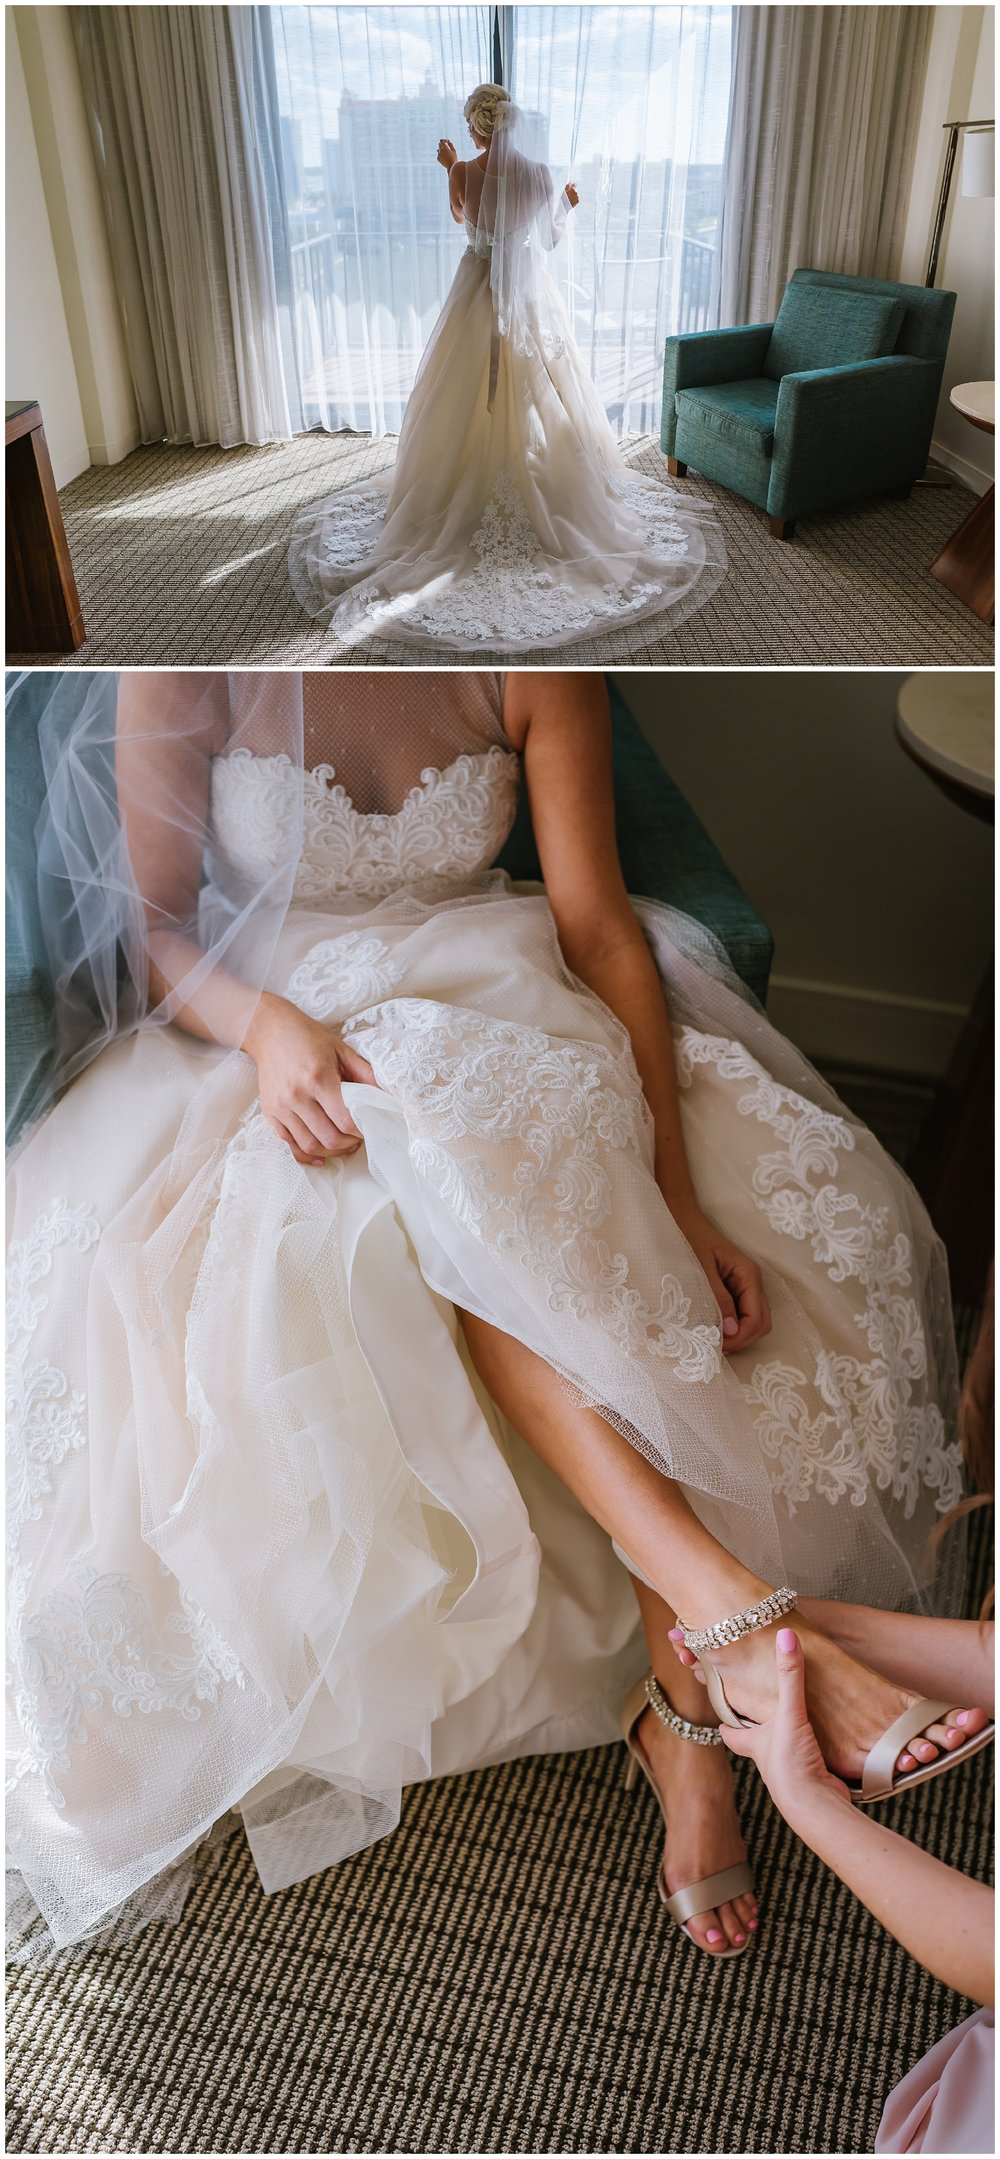 Sarasota-wedding-photographer-hyatt-regency-blush_0022.jpg